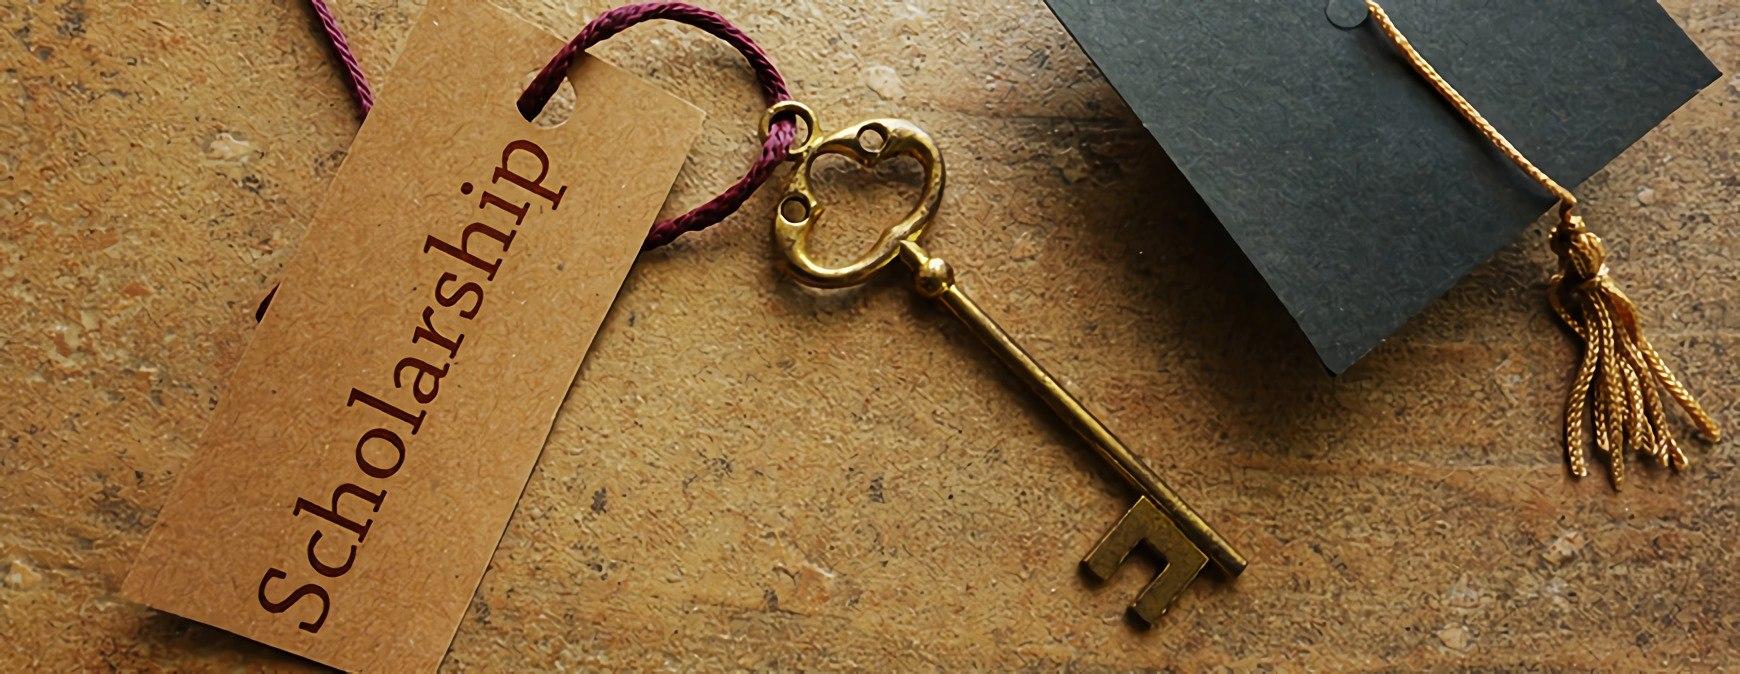 scholarship and key